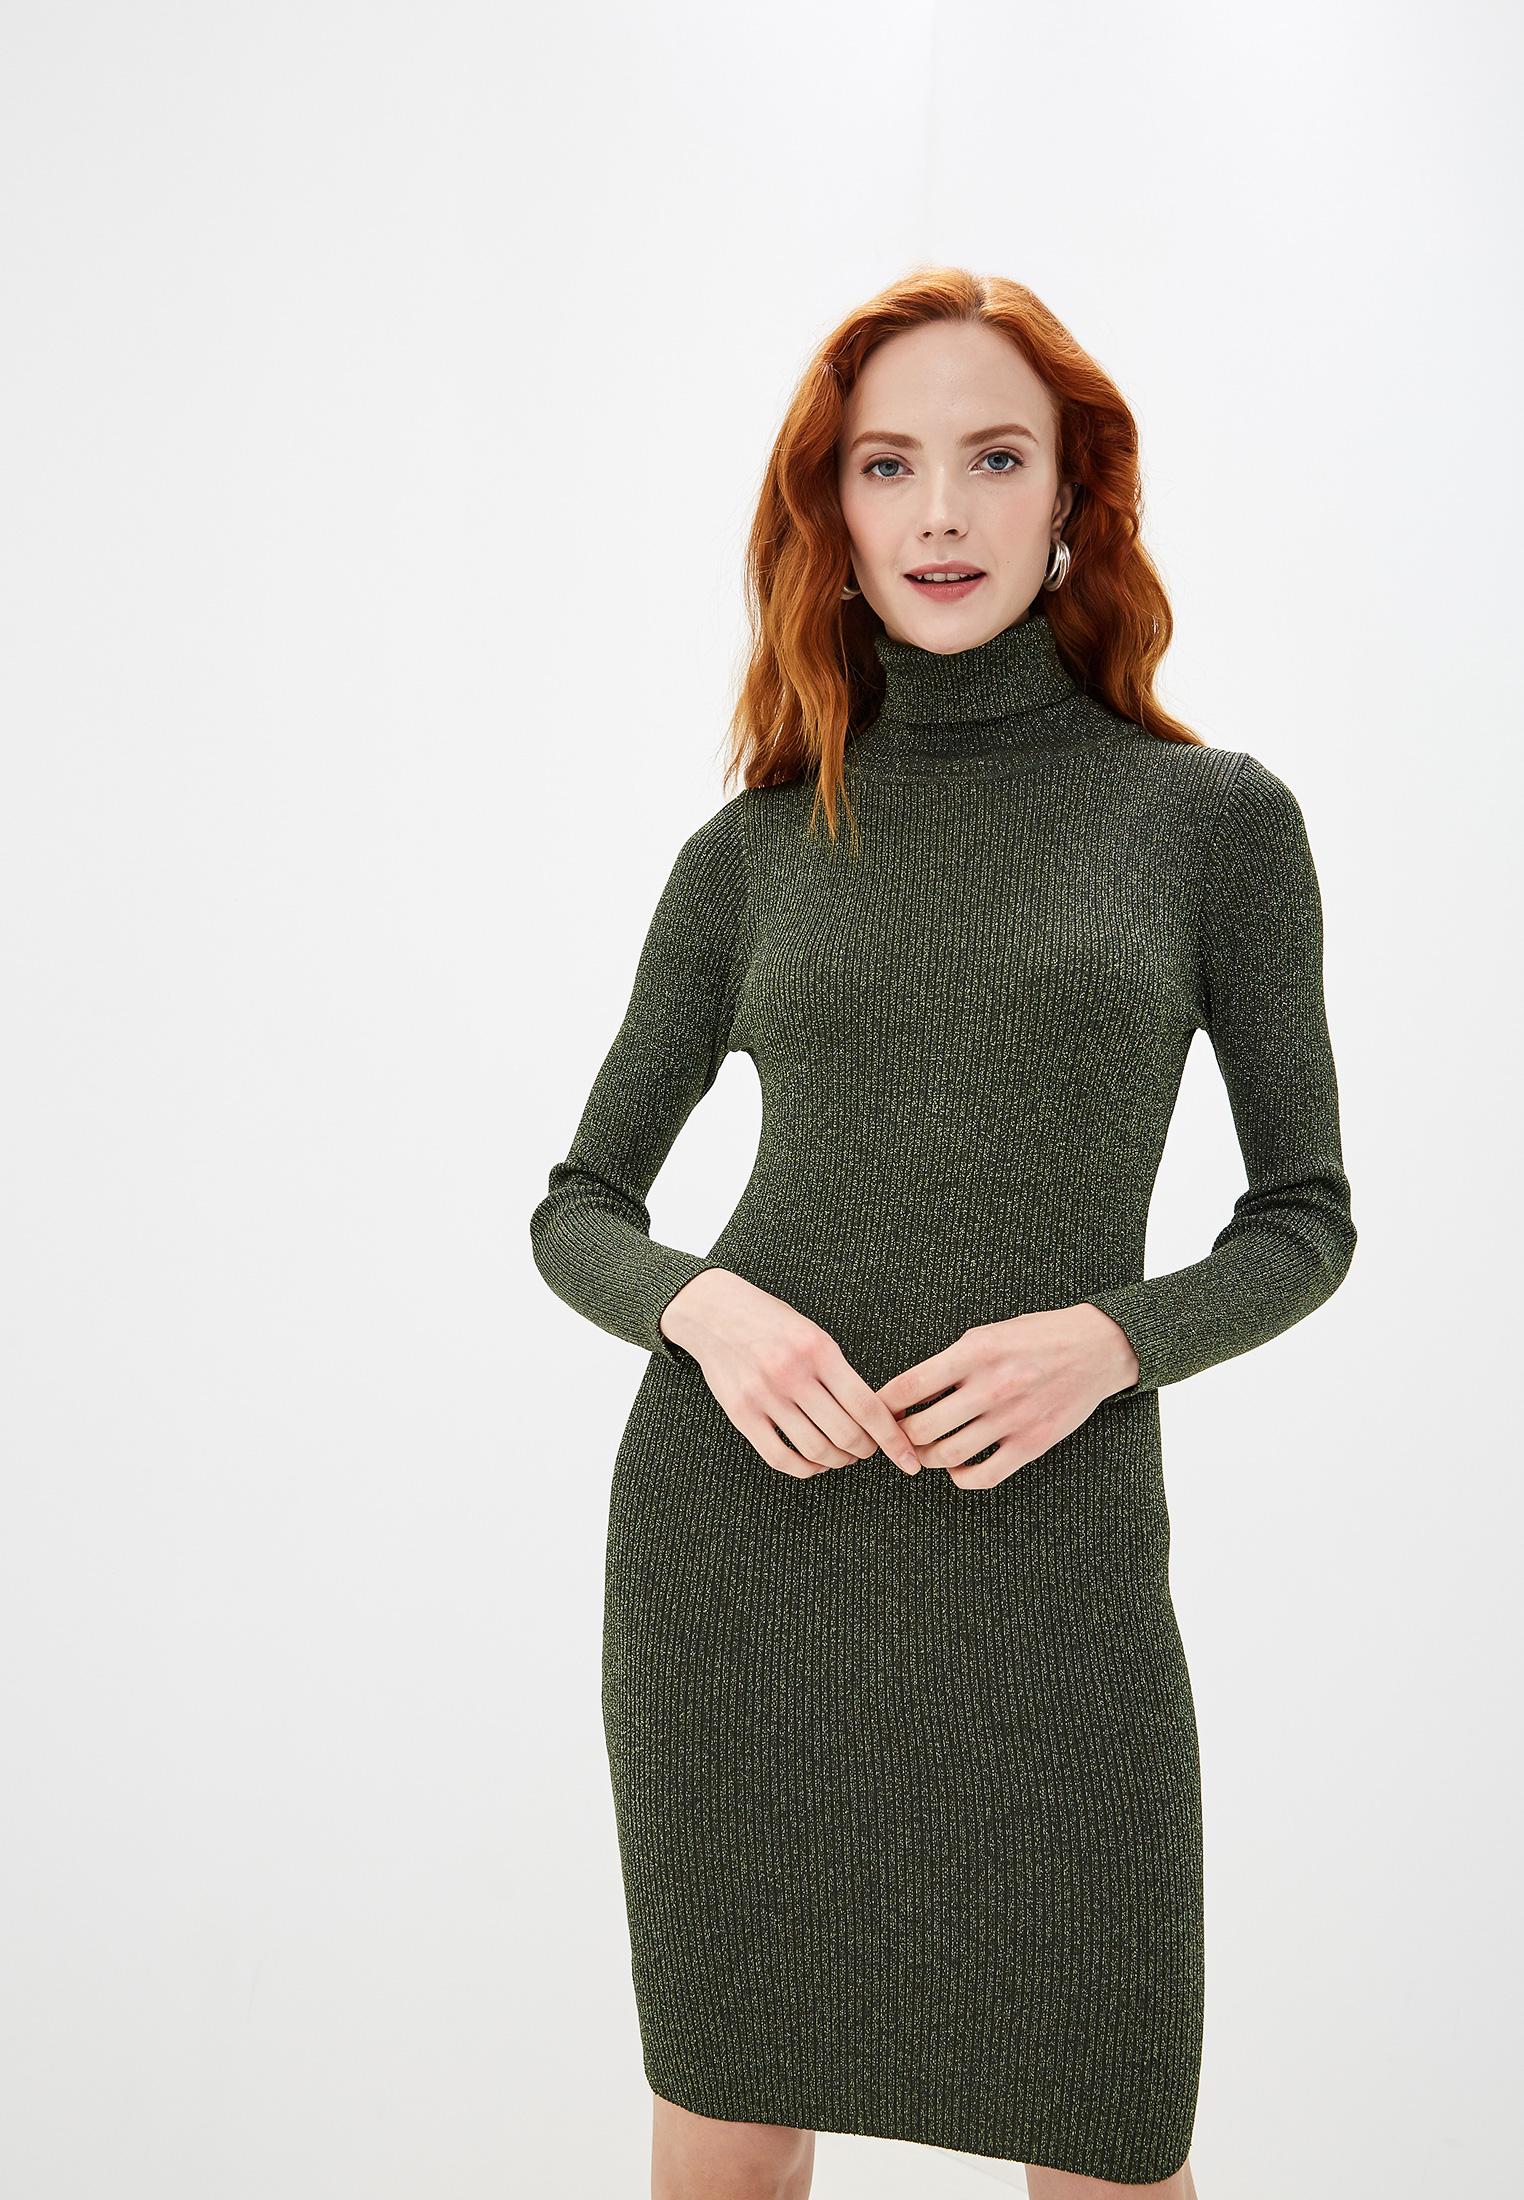 Вязаное платье Liana L410-1